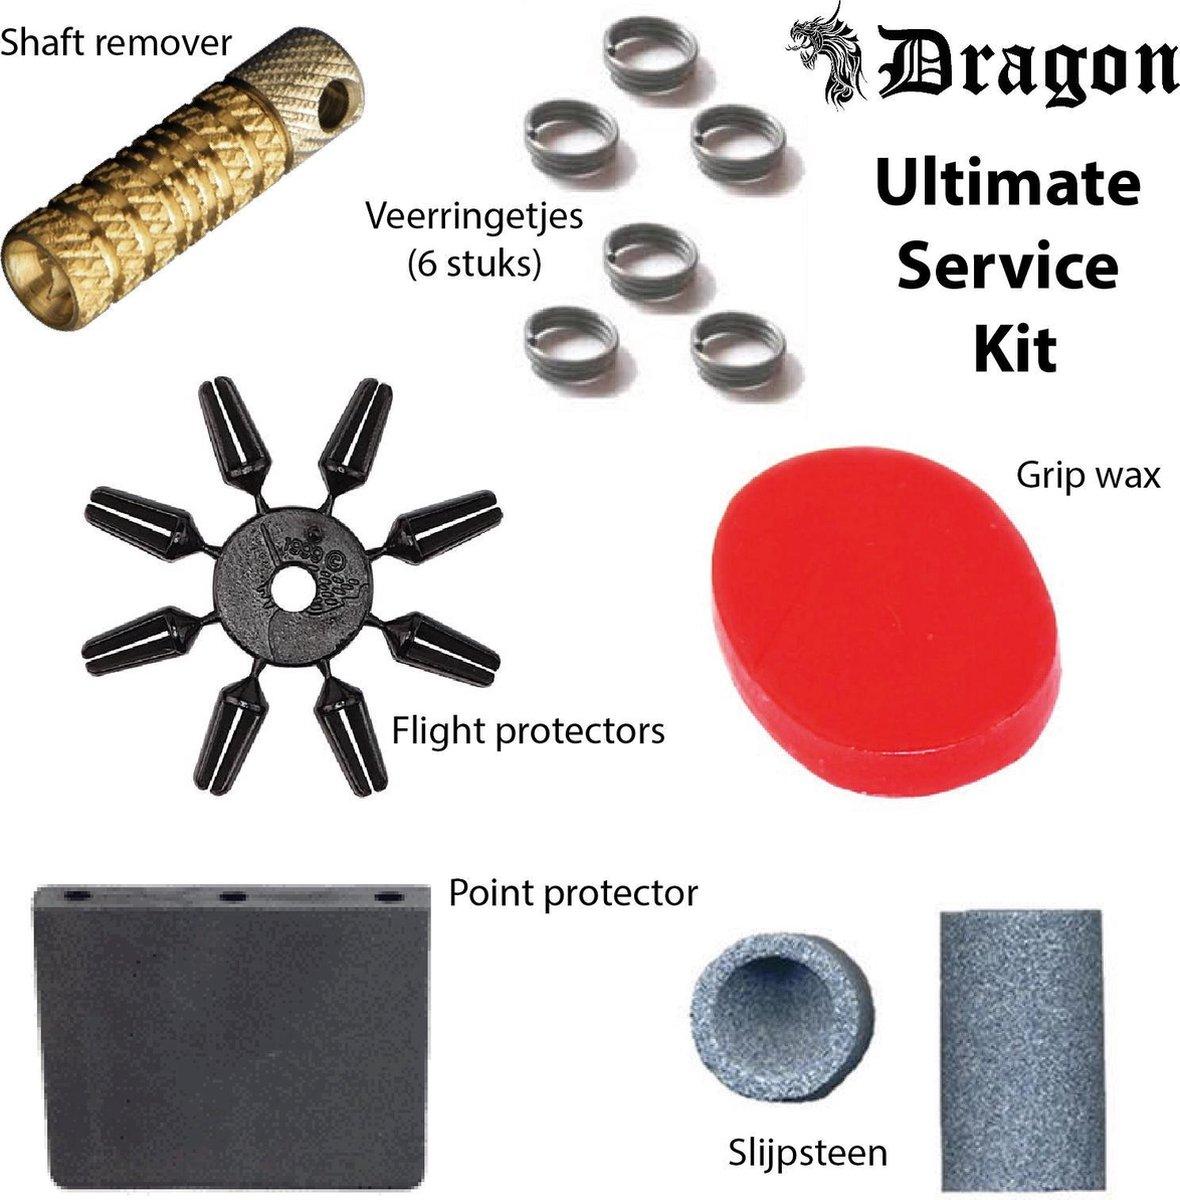 Dragon darts - Ultimate Darts Service Kit - Darts accessoires - tune up kit